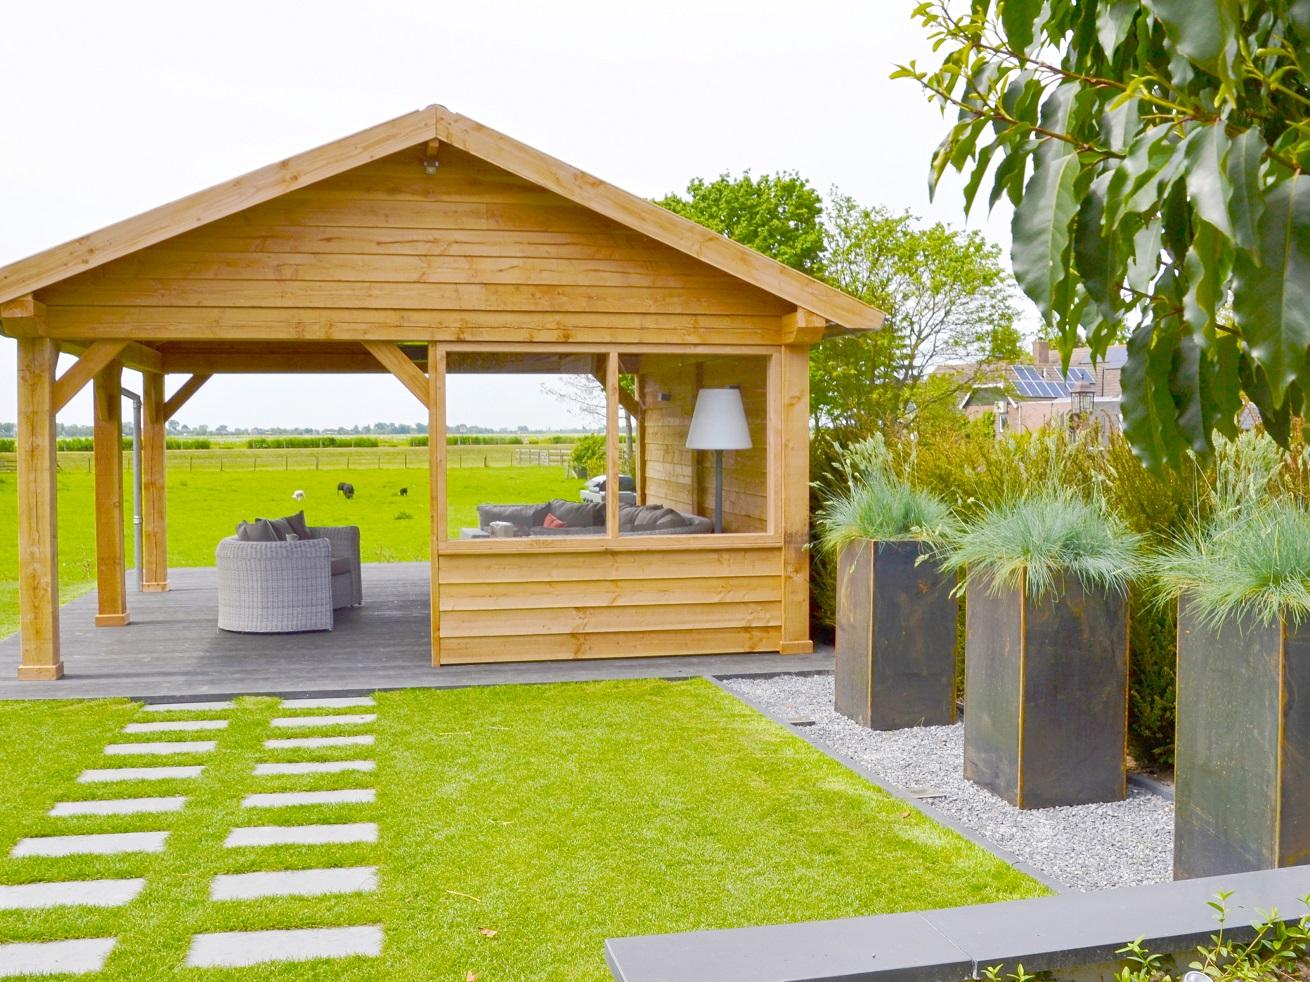 Tuinaanleg: moderne loungetuin met douglas overkapping en composiet vlonder